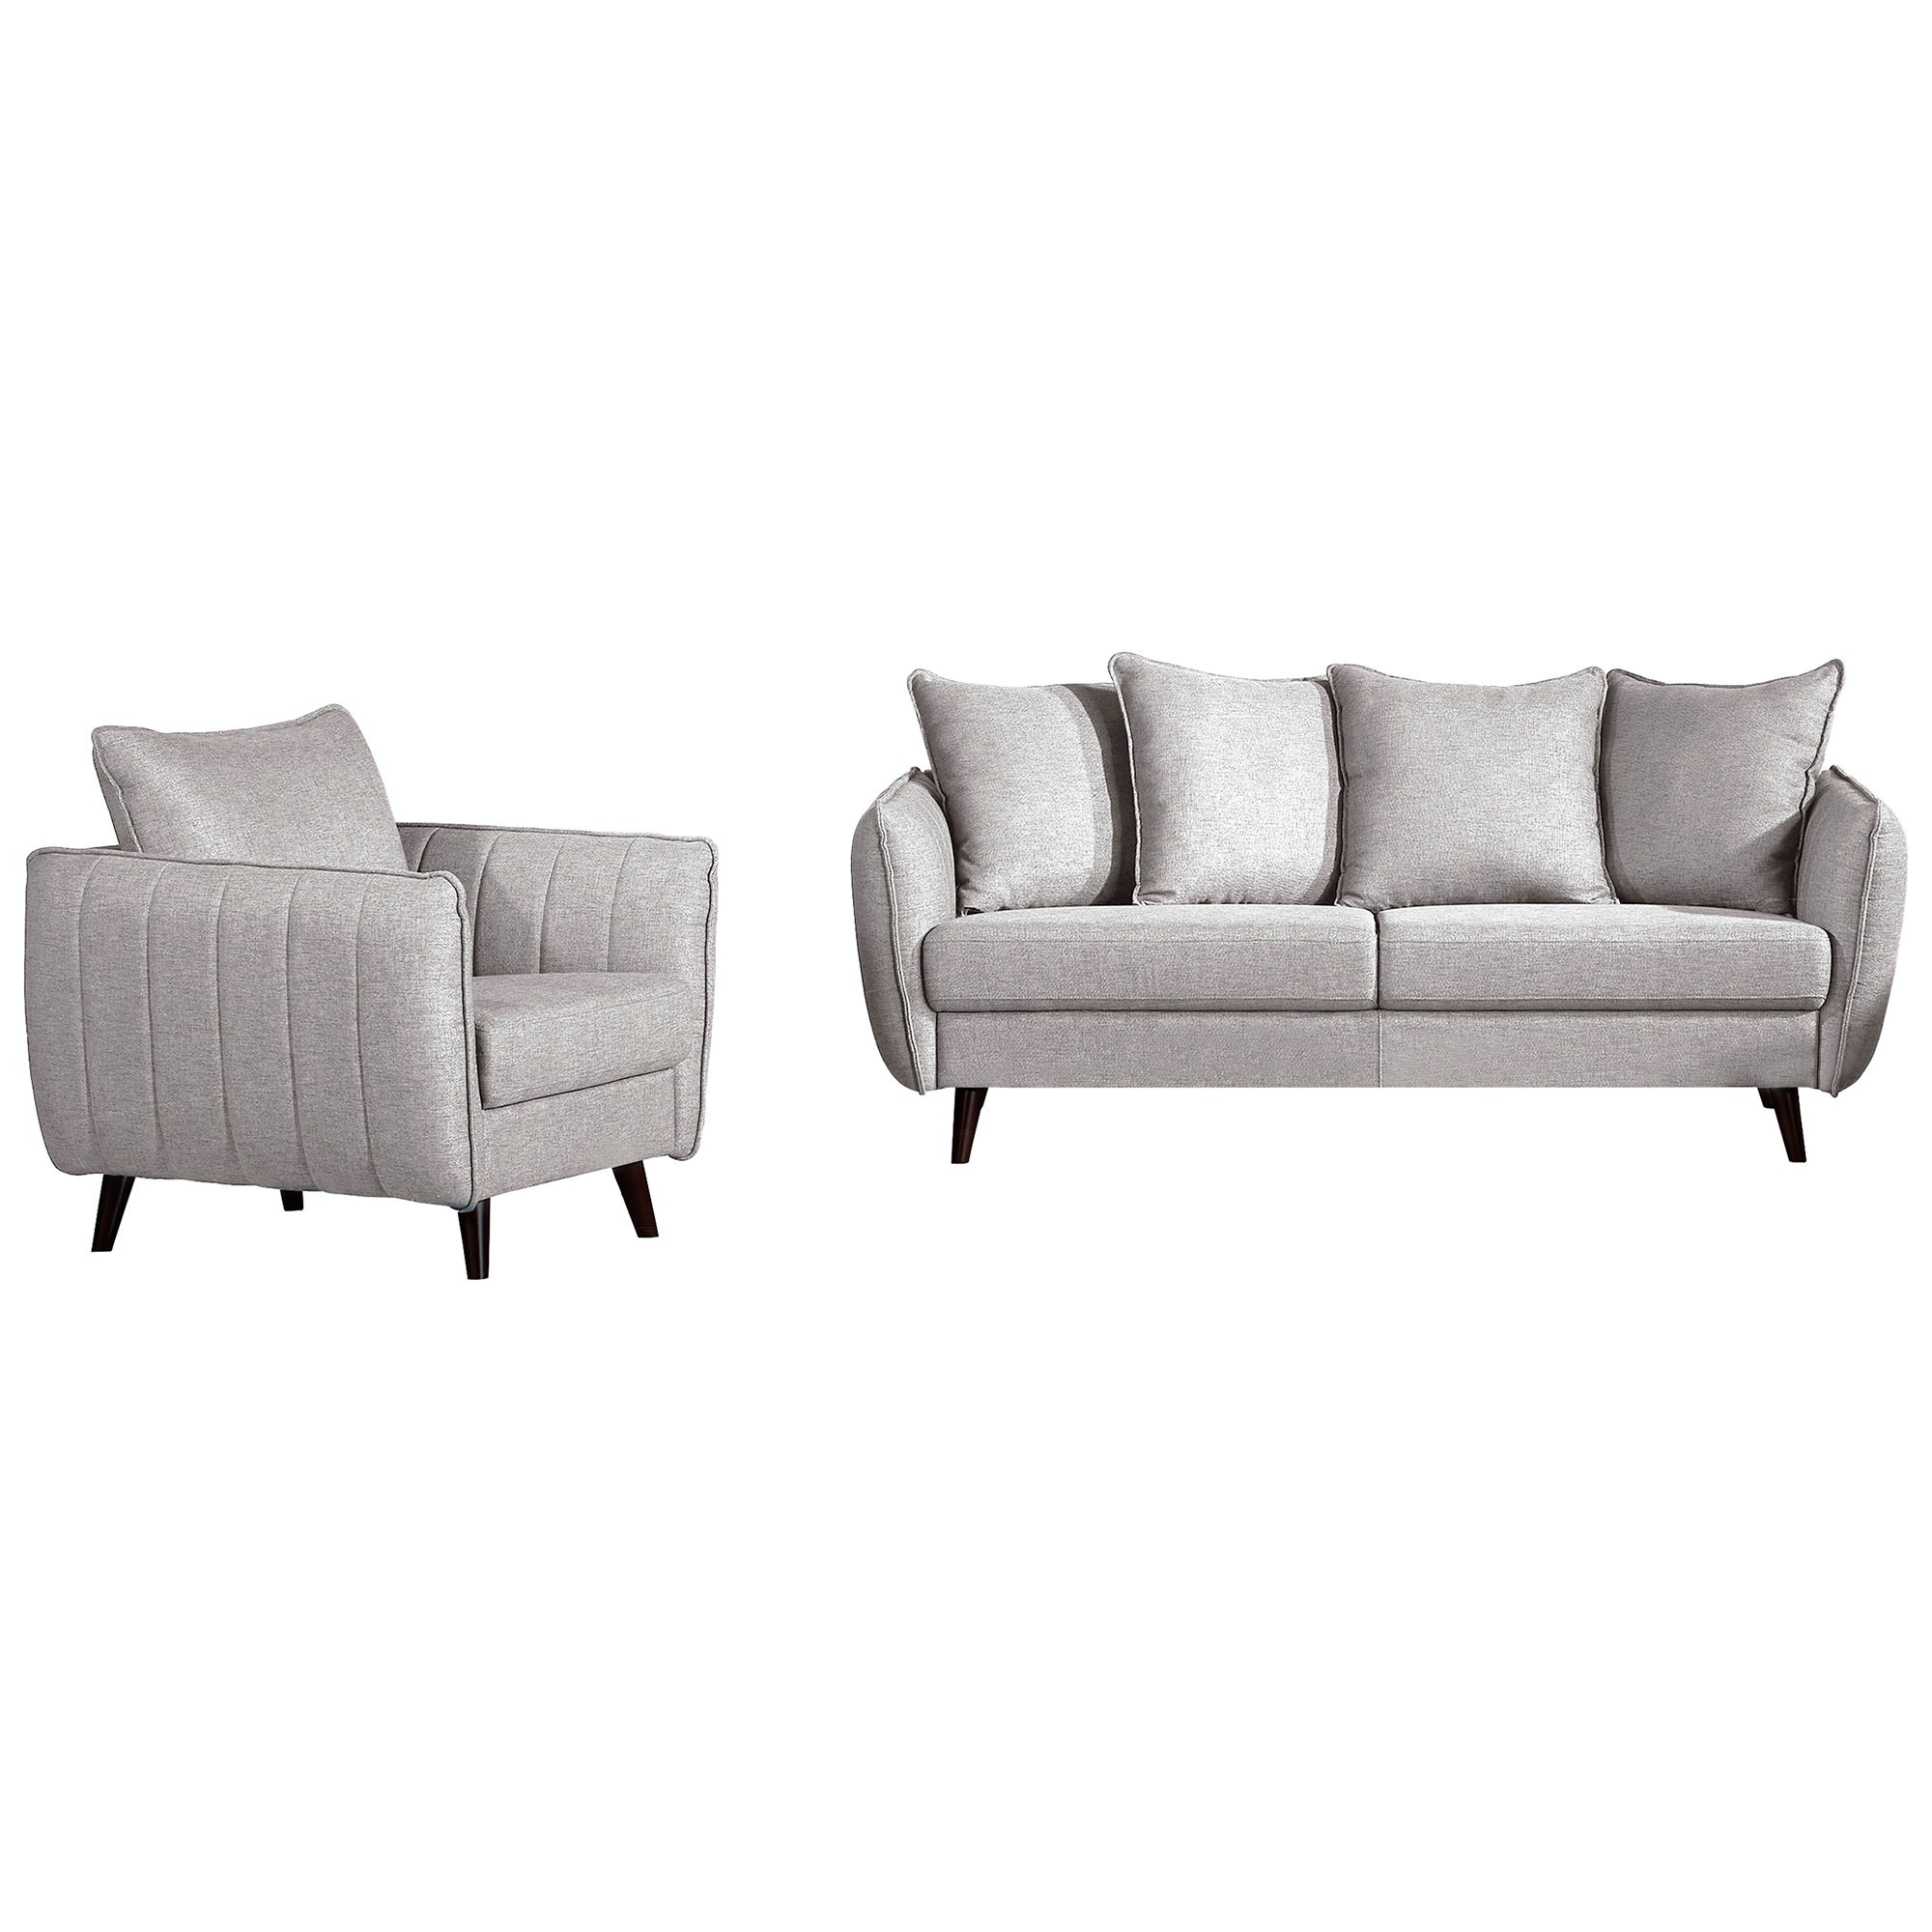 Zaria 2 Piece Fabric Lounge Set, 3+1 Seater, Grey